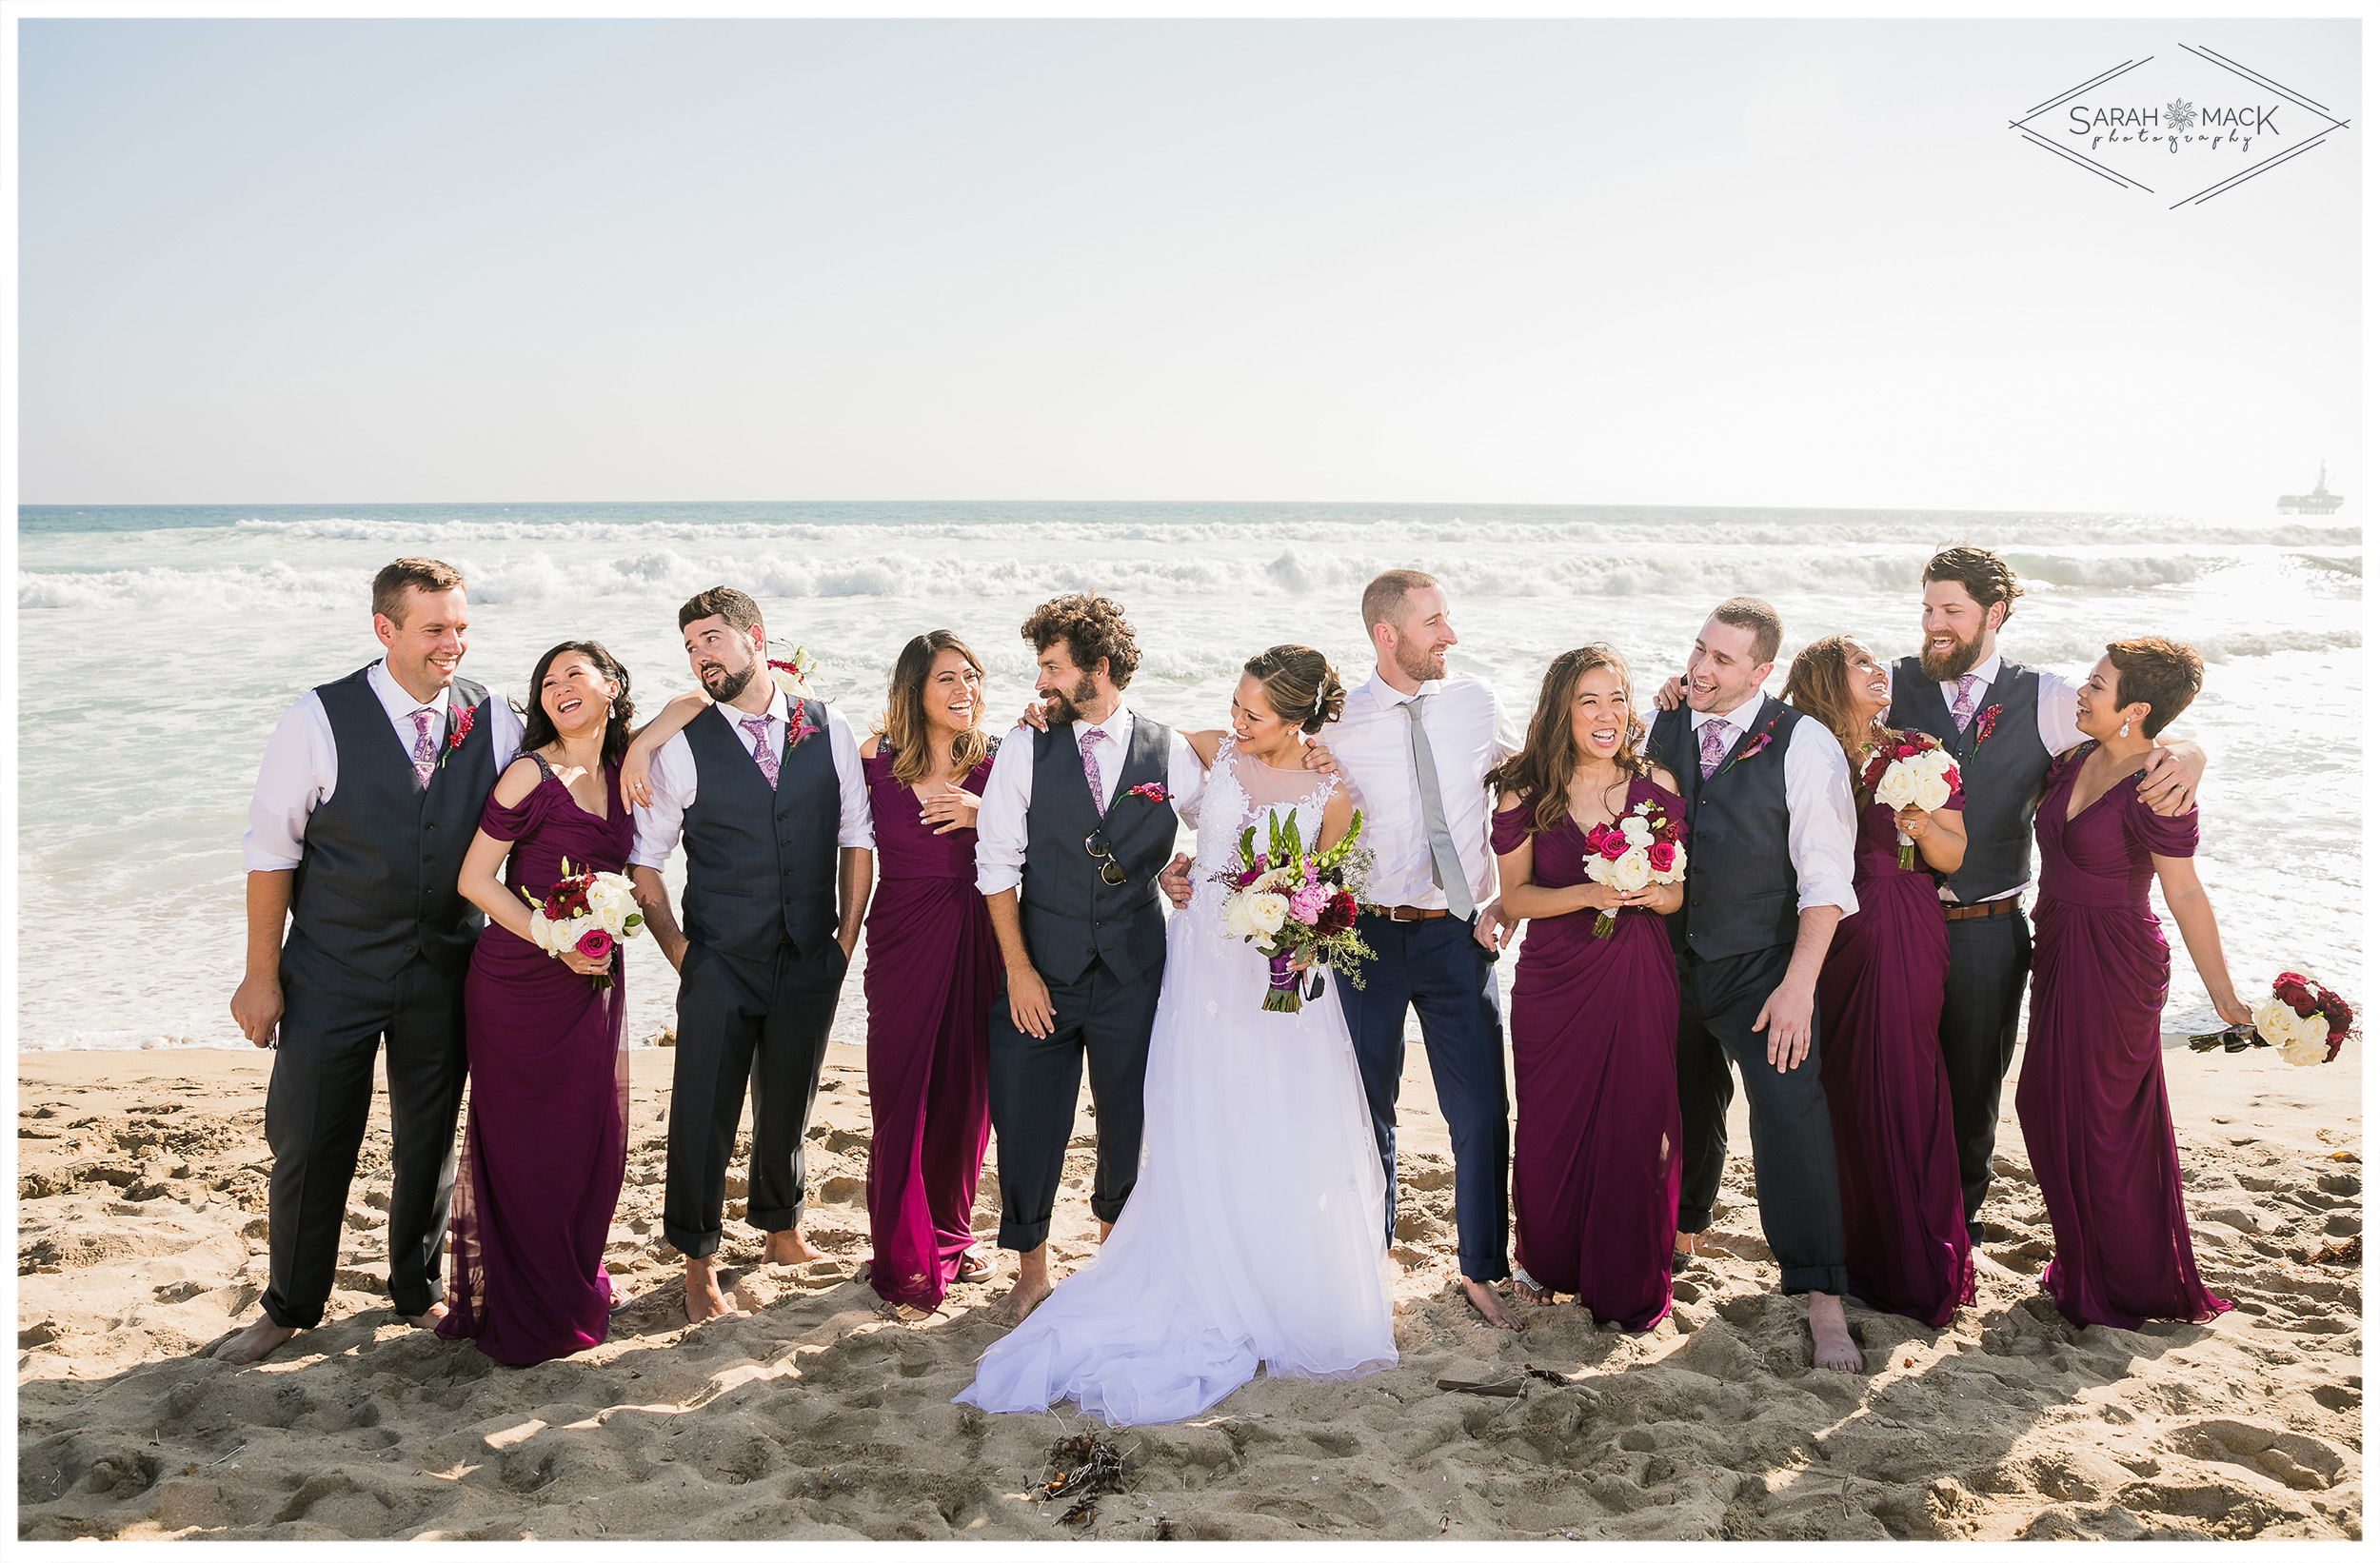 MR-Sea-Cliff-Country-Club-Wedding-Photography-45.jpg